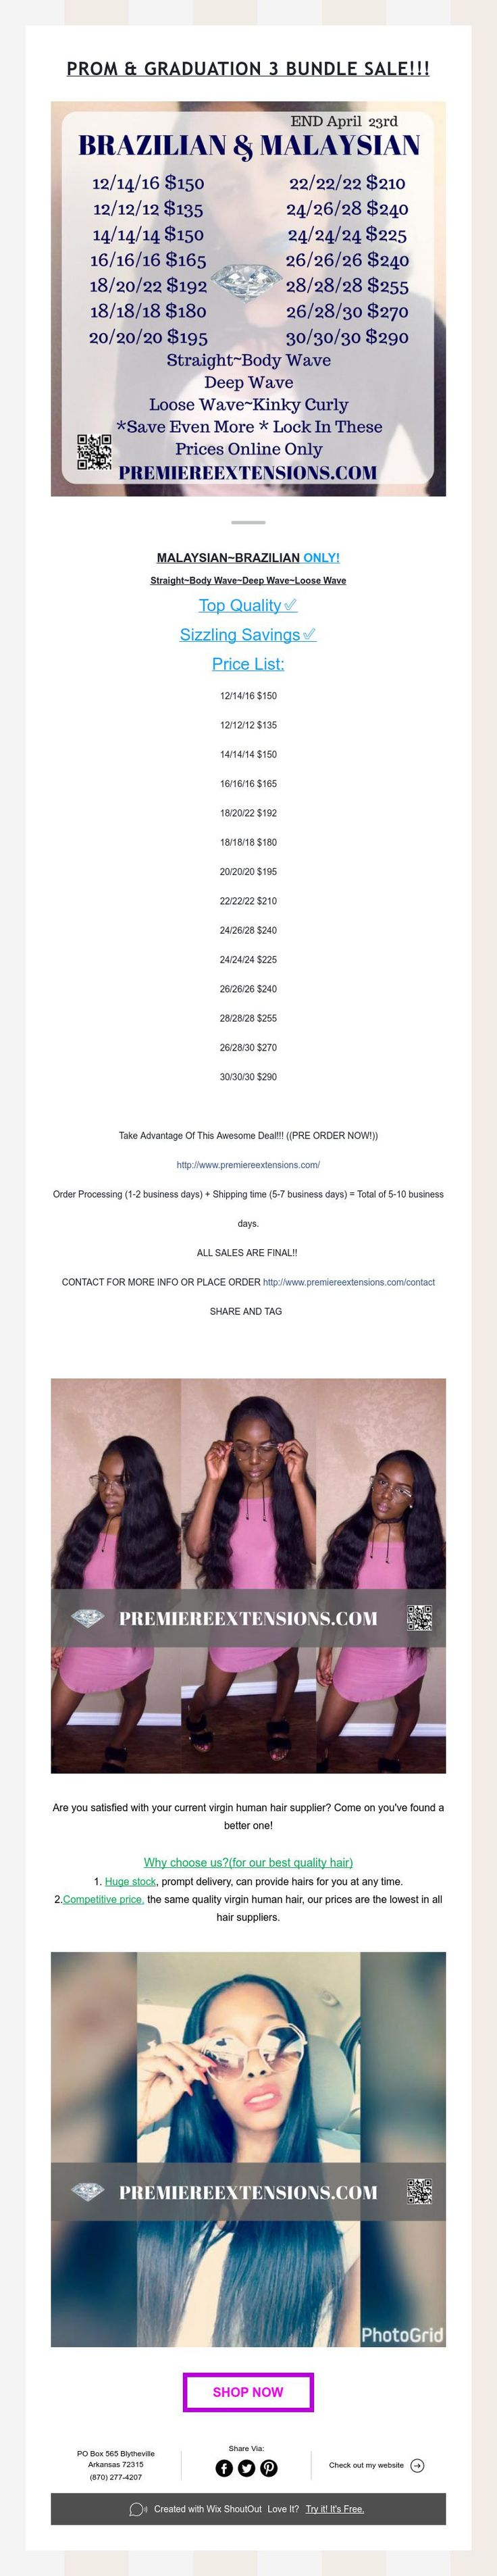 Prom & Graduation 3 Bundle Sale!!! 💁🏾 💃💃💃💃